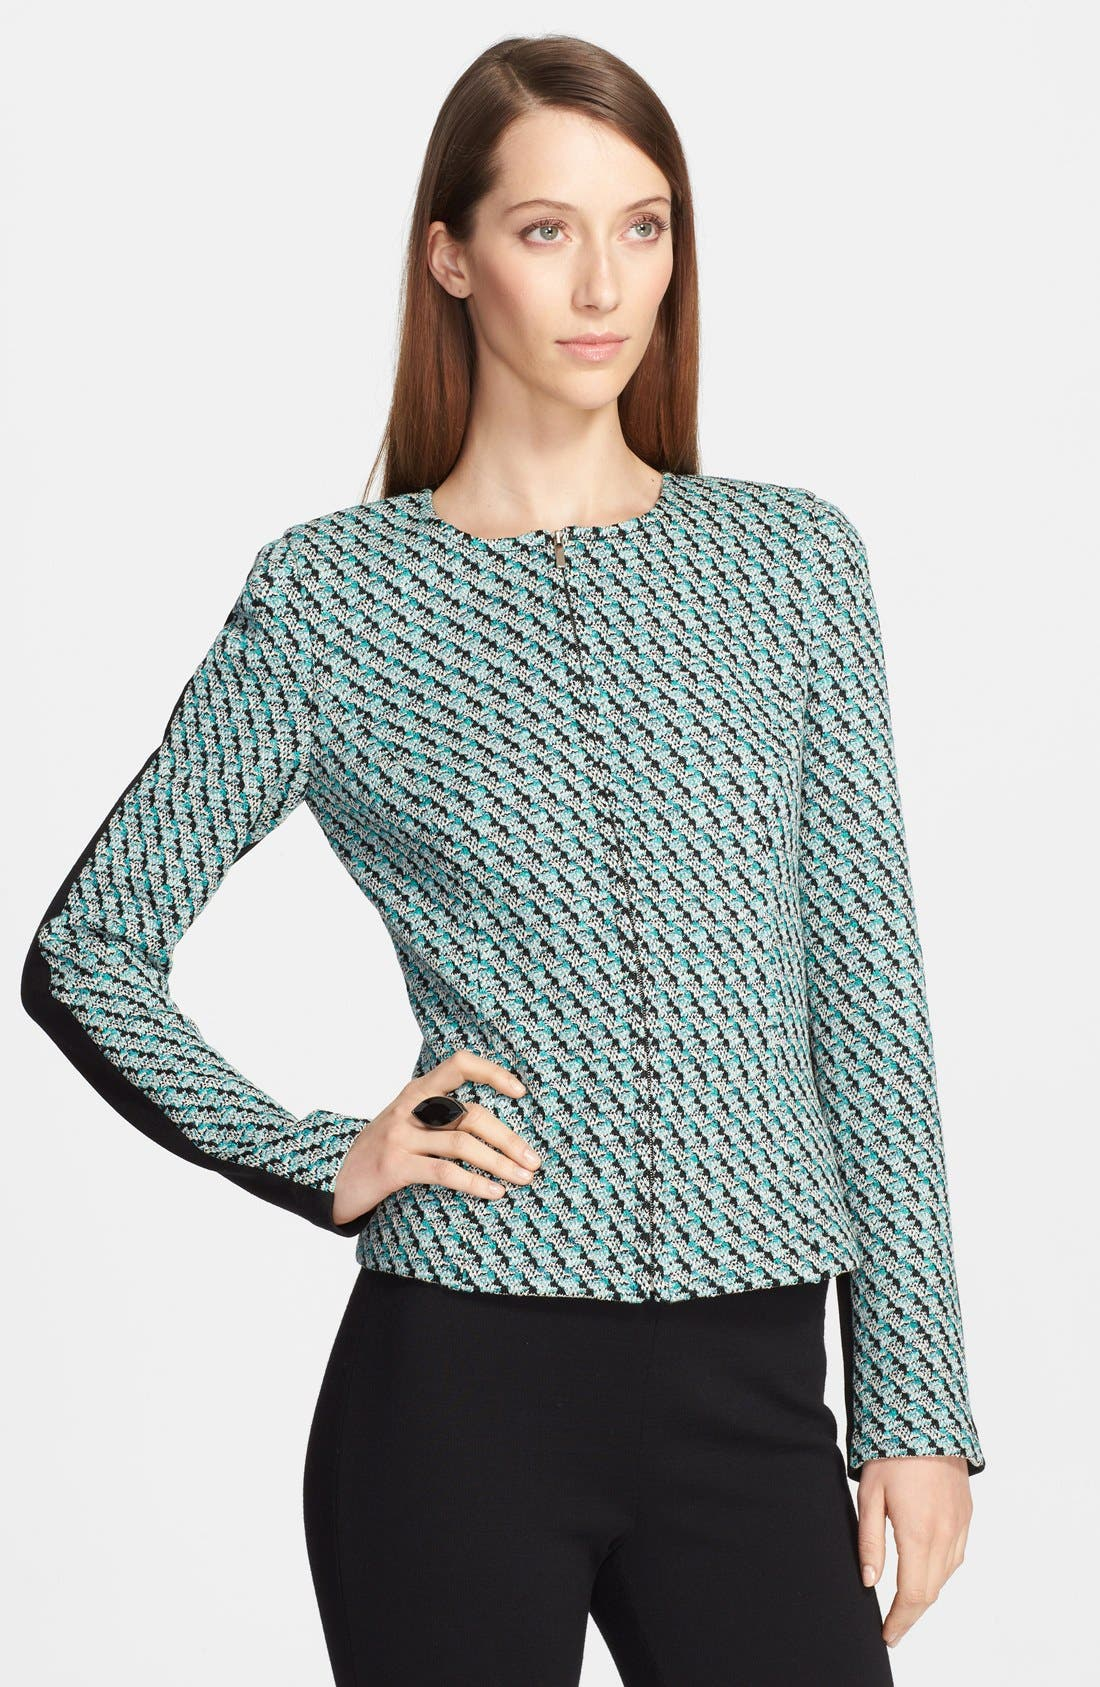 Alternate Image 1 Selected - St. John Collection Broken Houndstooth Tweed & Milano Knit Zip Jacket